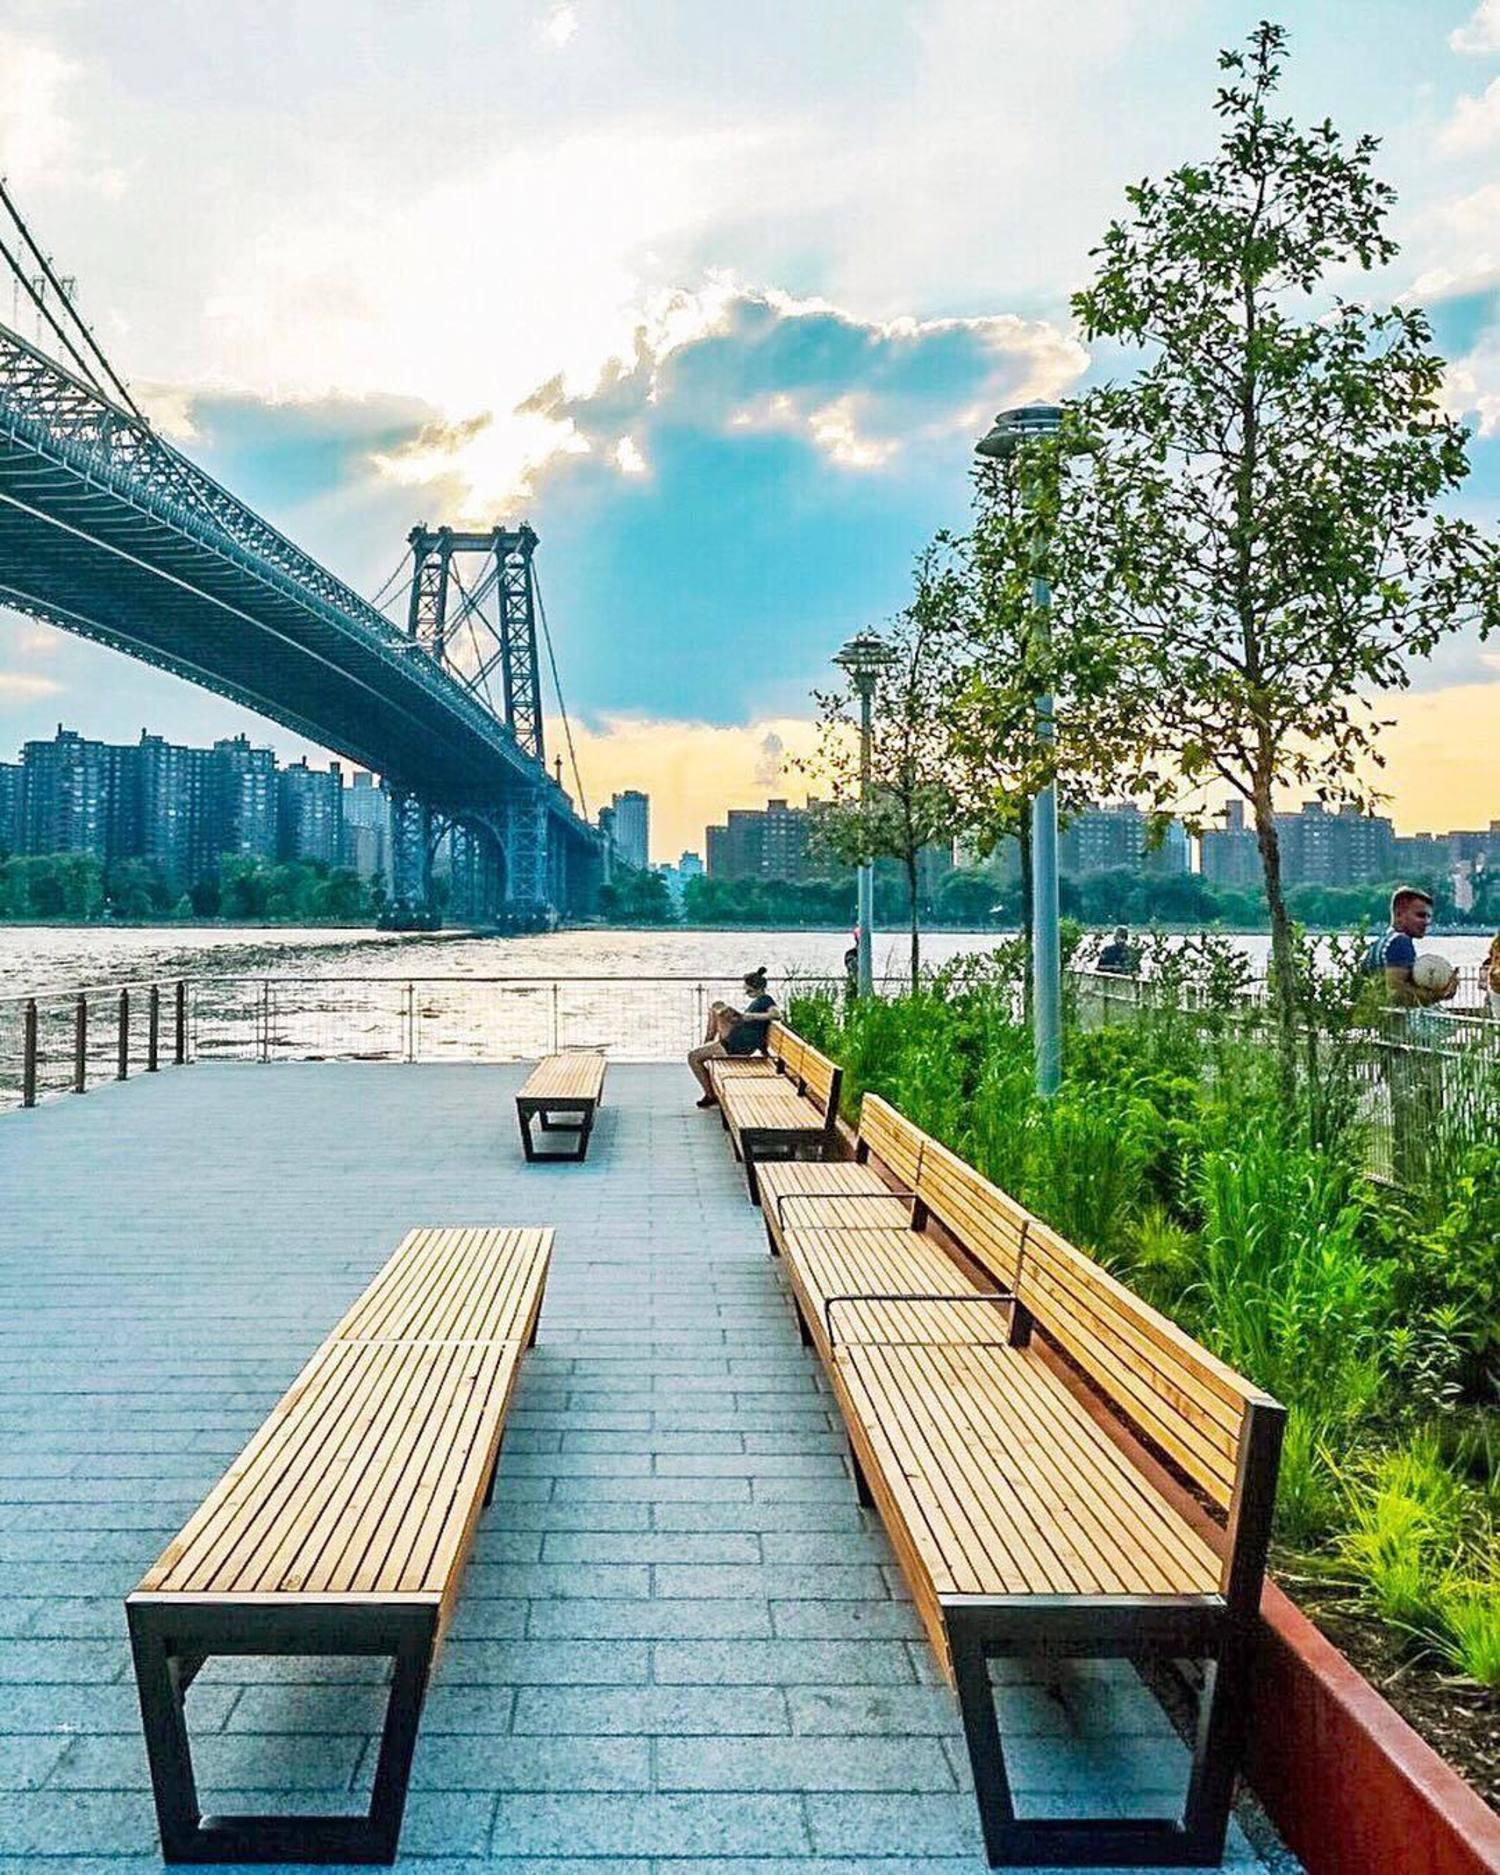 Domino Park, Brooklyn. Photo via @ctg125 #viewingnyc #newyork #newyorkcity #nyc #dominopark #williamsburgbridge